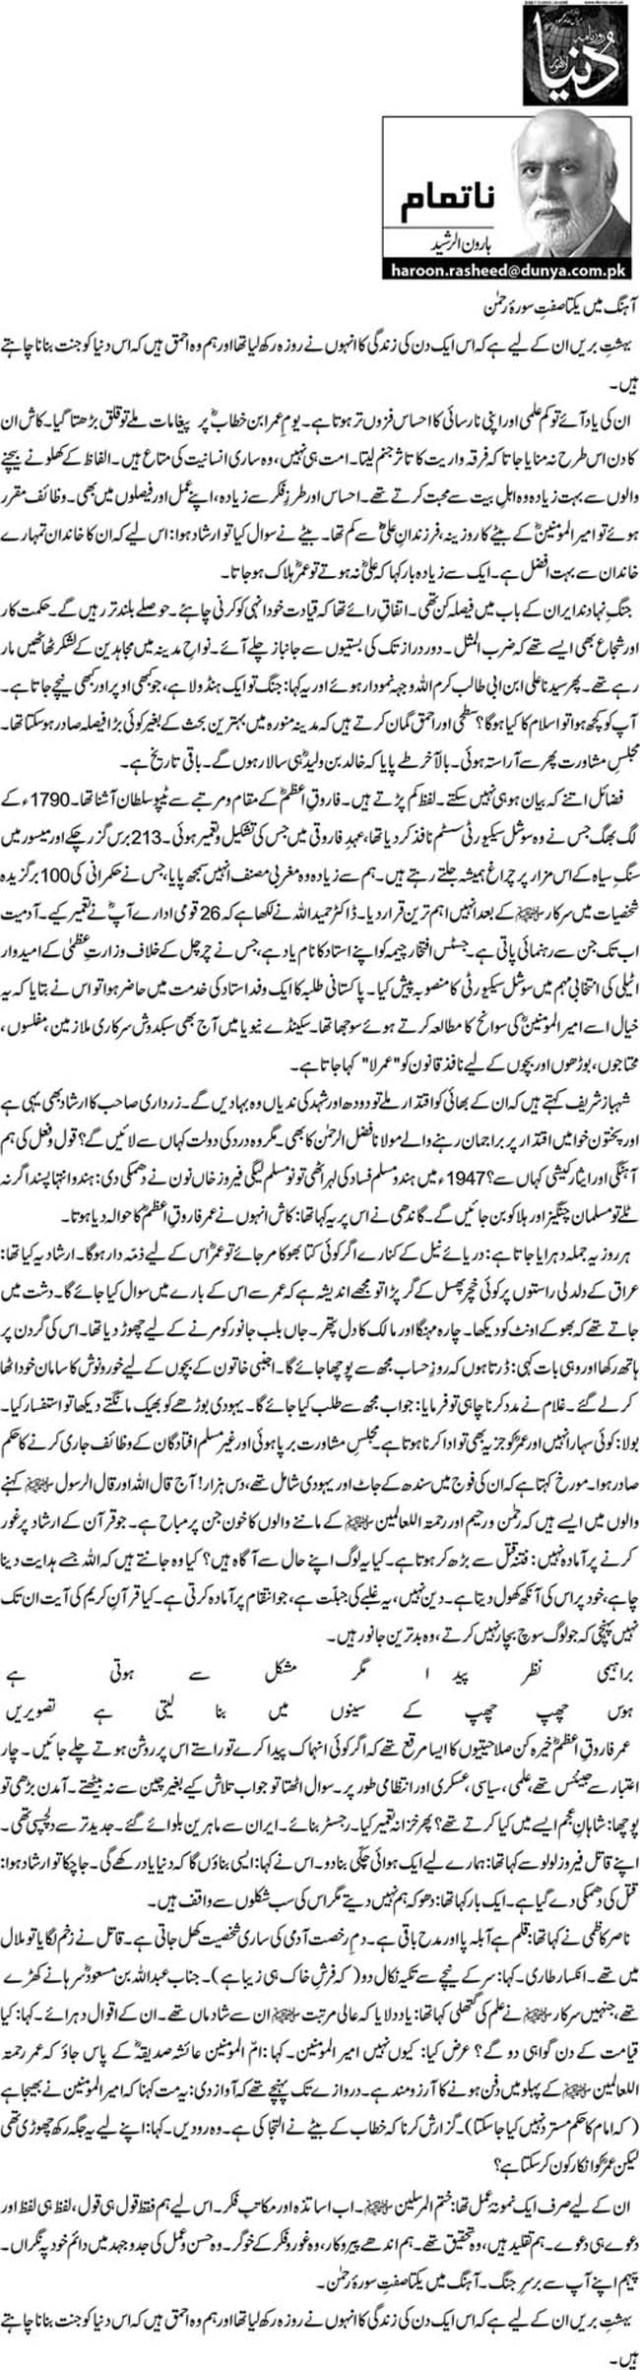 Aahang main yakta sifat e Sorat e Rehman - Haroon-ur-Rasheed